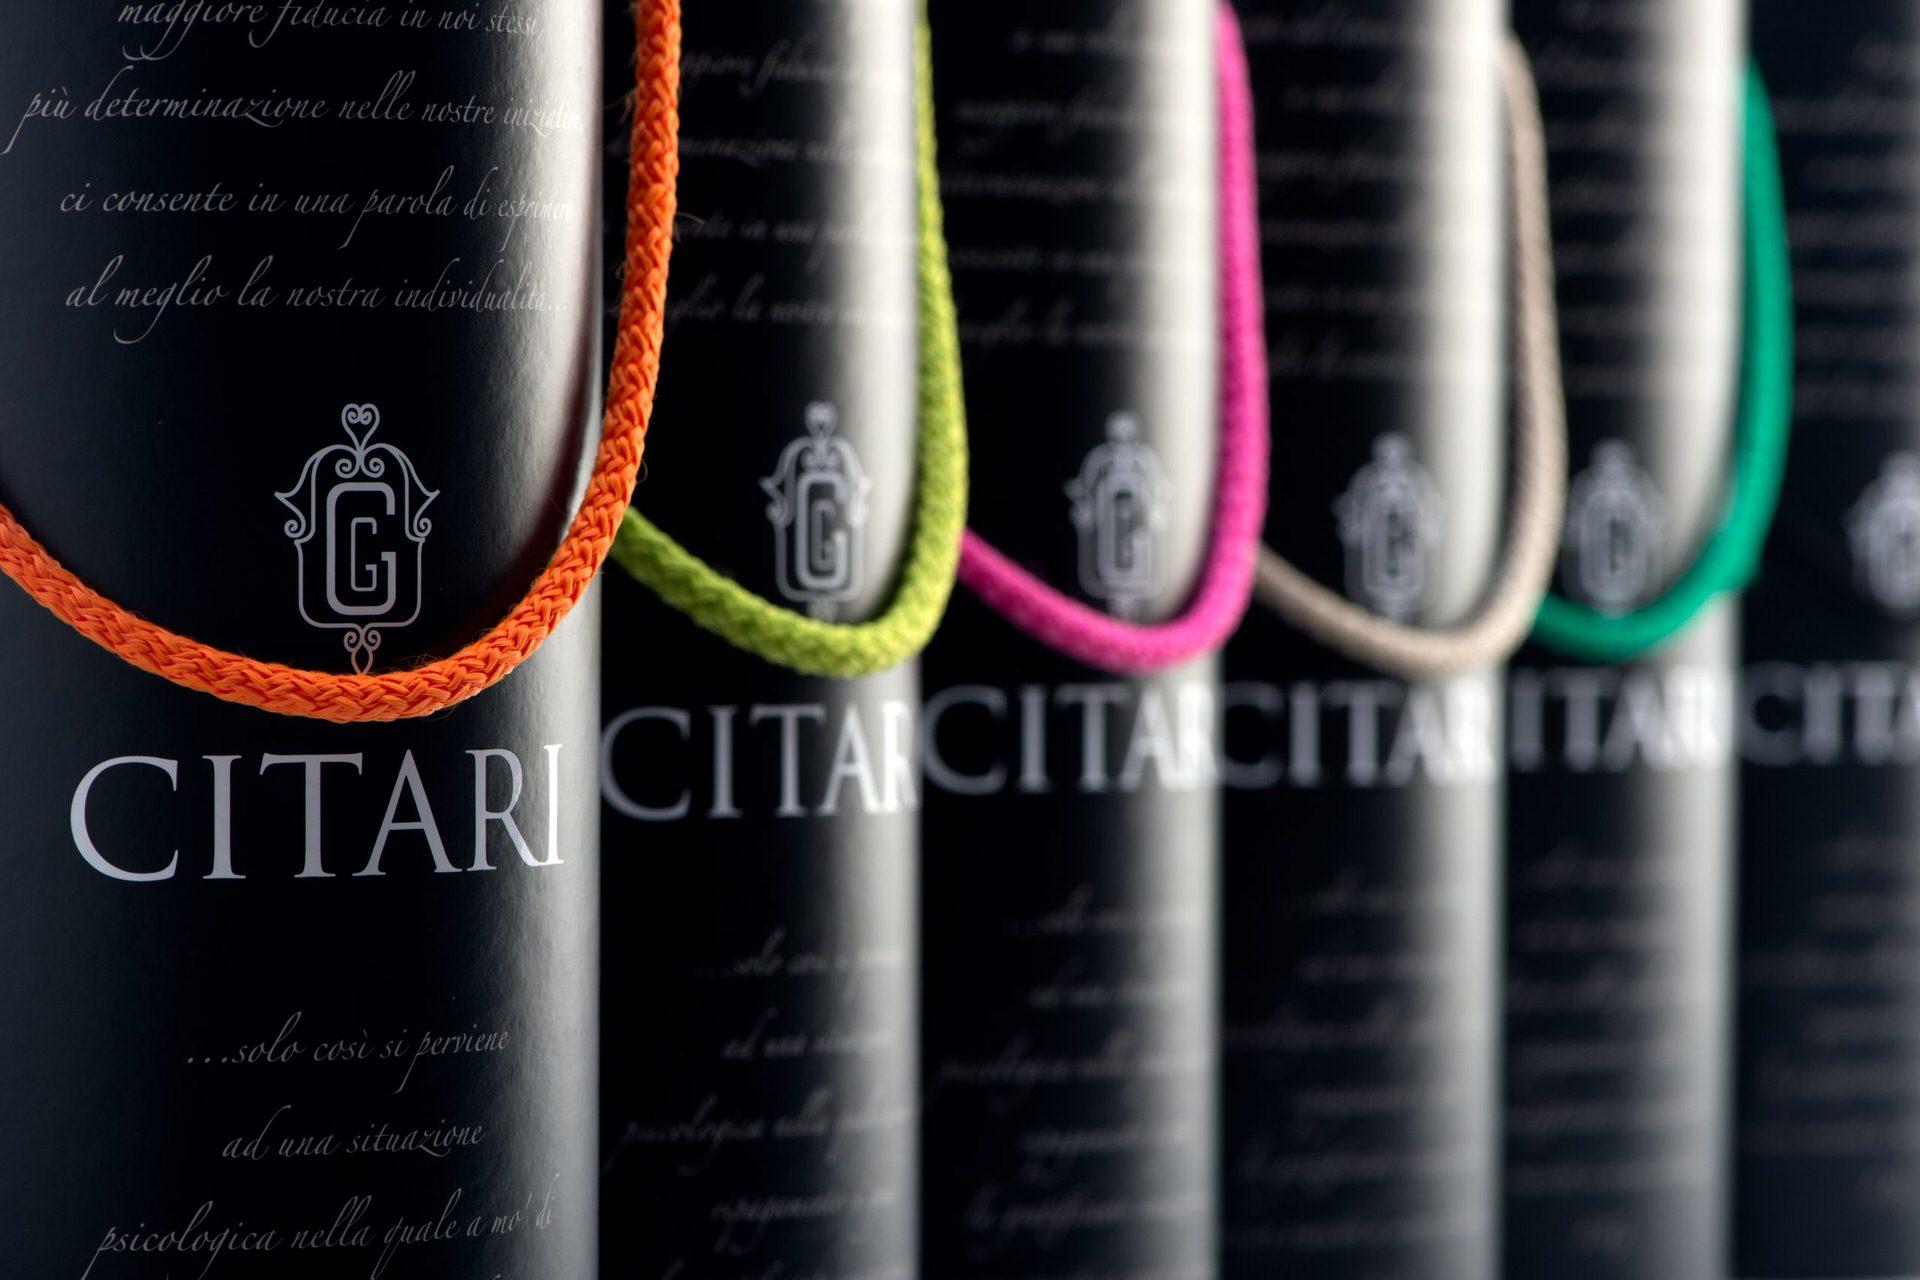 photoring-still life prodotti cantina vini